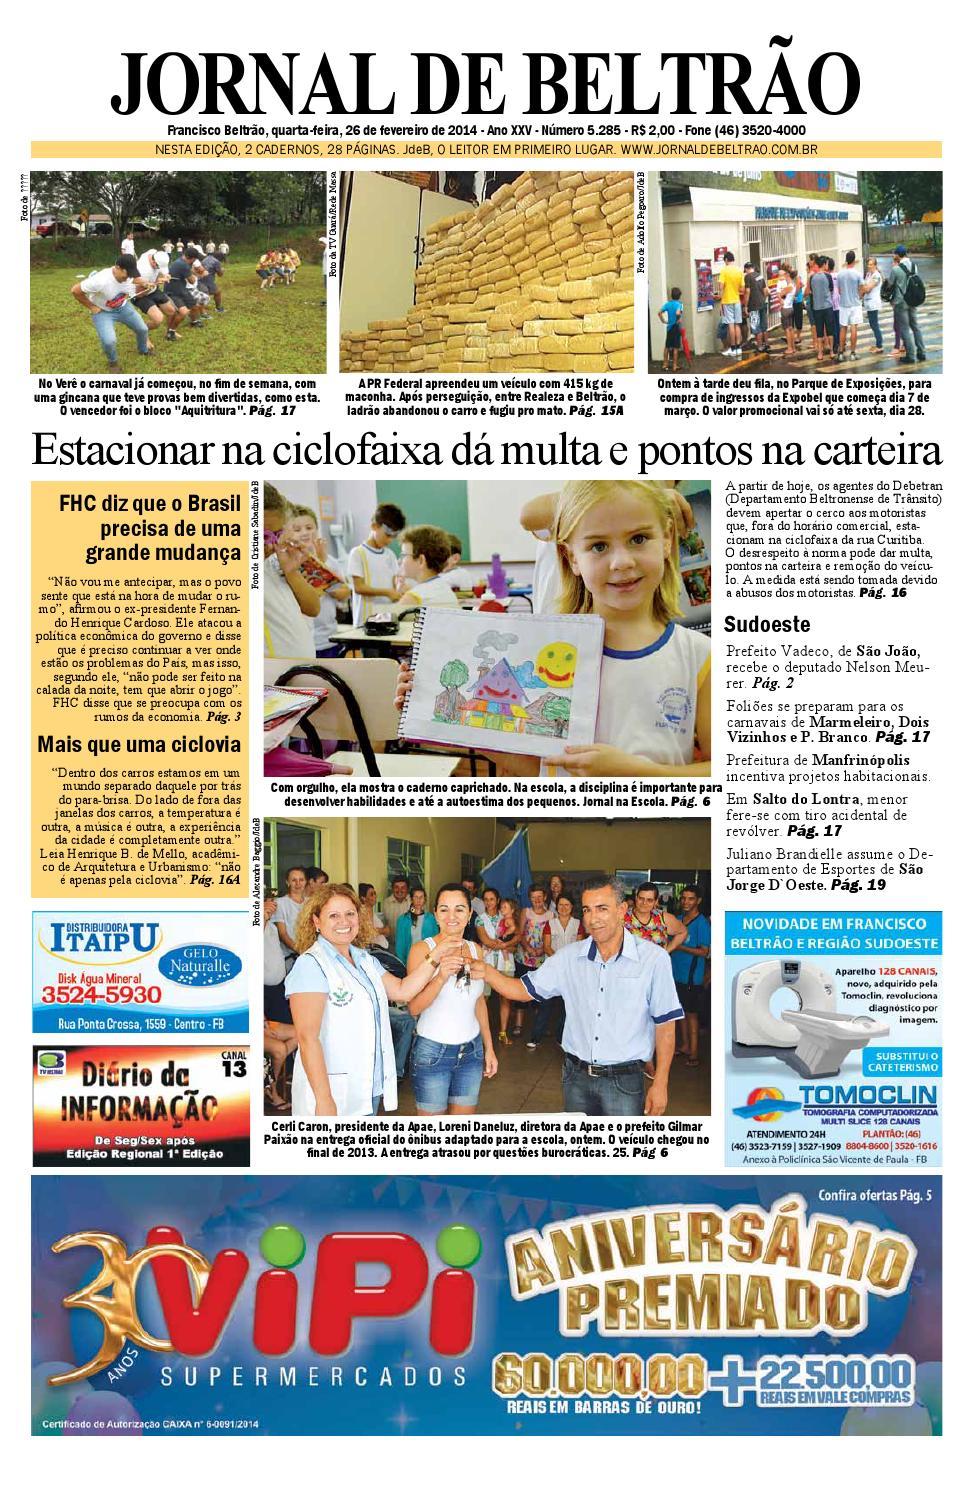 Jornaldebeltrão 5285 2014 02 26 by Orangotoe - issuu c7d07b9141